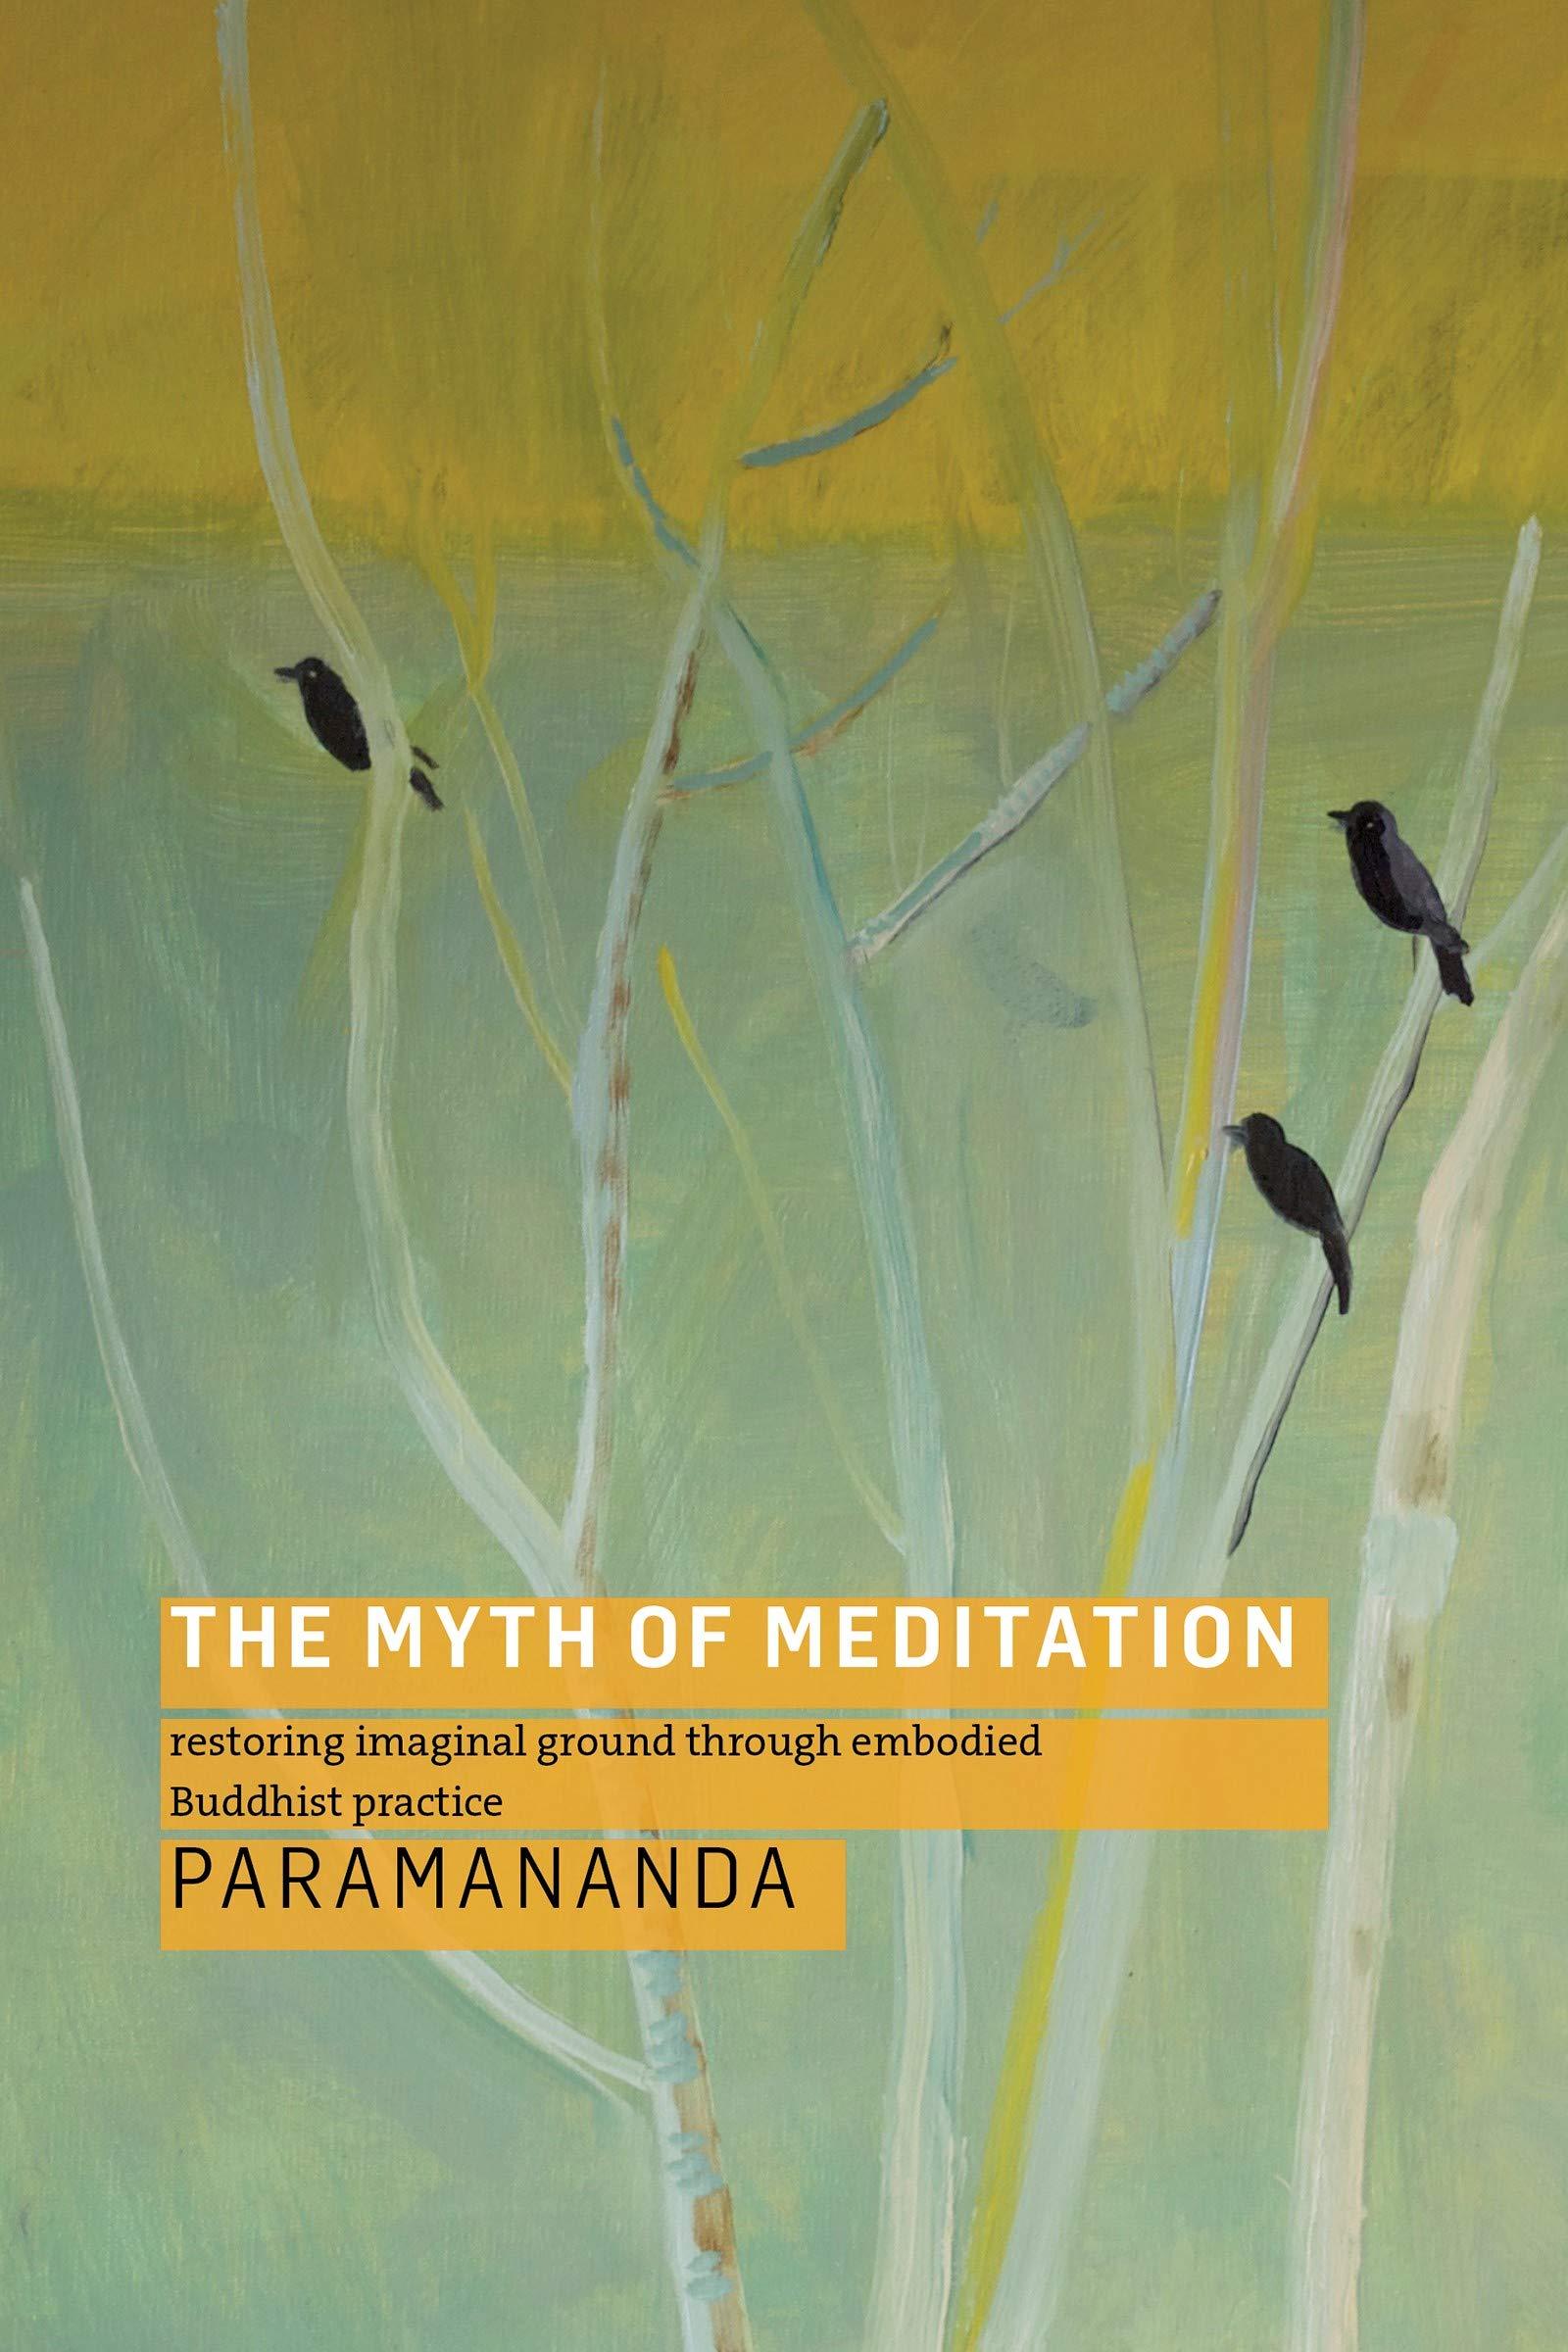 Paramananda Myth of Meditation cover art